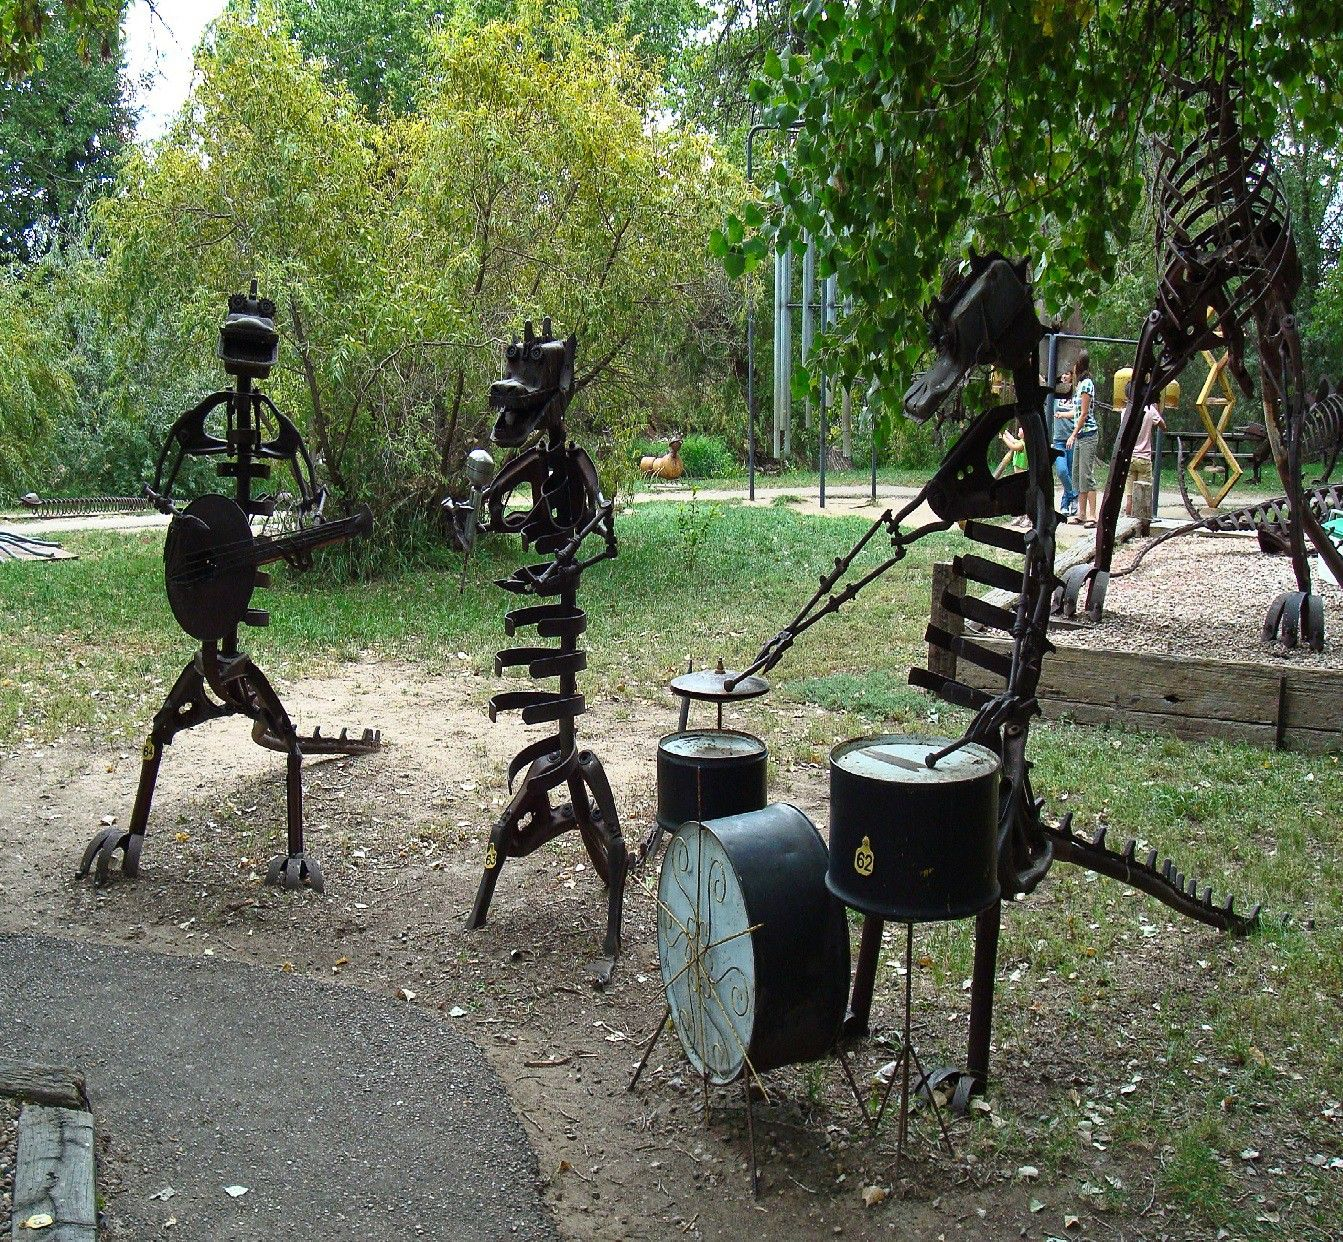 Pin By Alia Maisarah On Garden In 2020 Metal Yard Art Yard Art Metal Art Welded